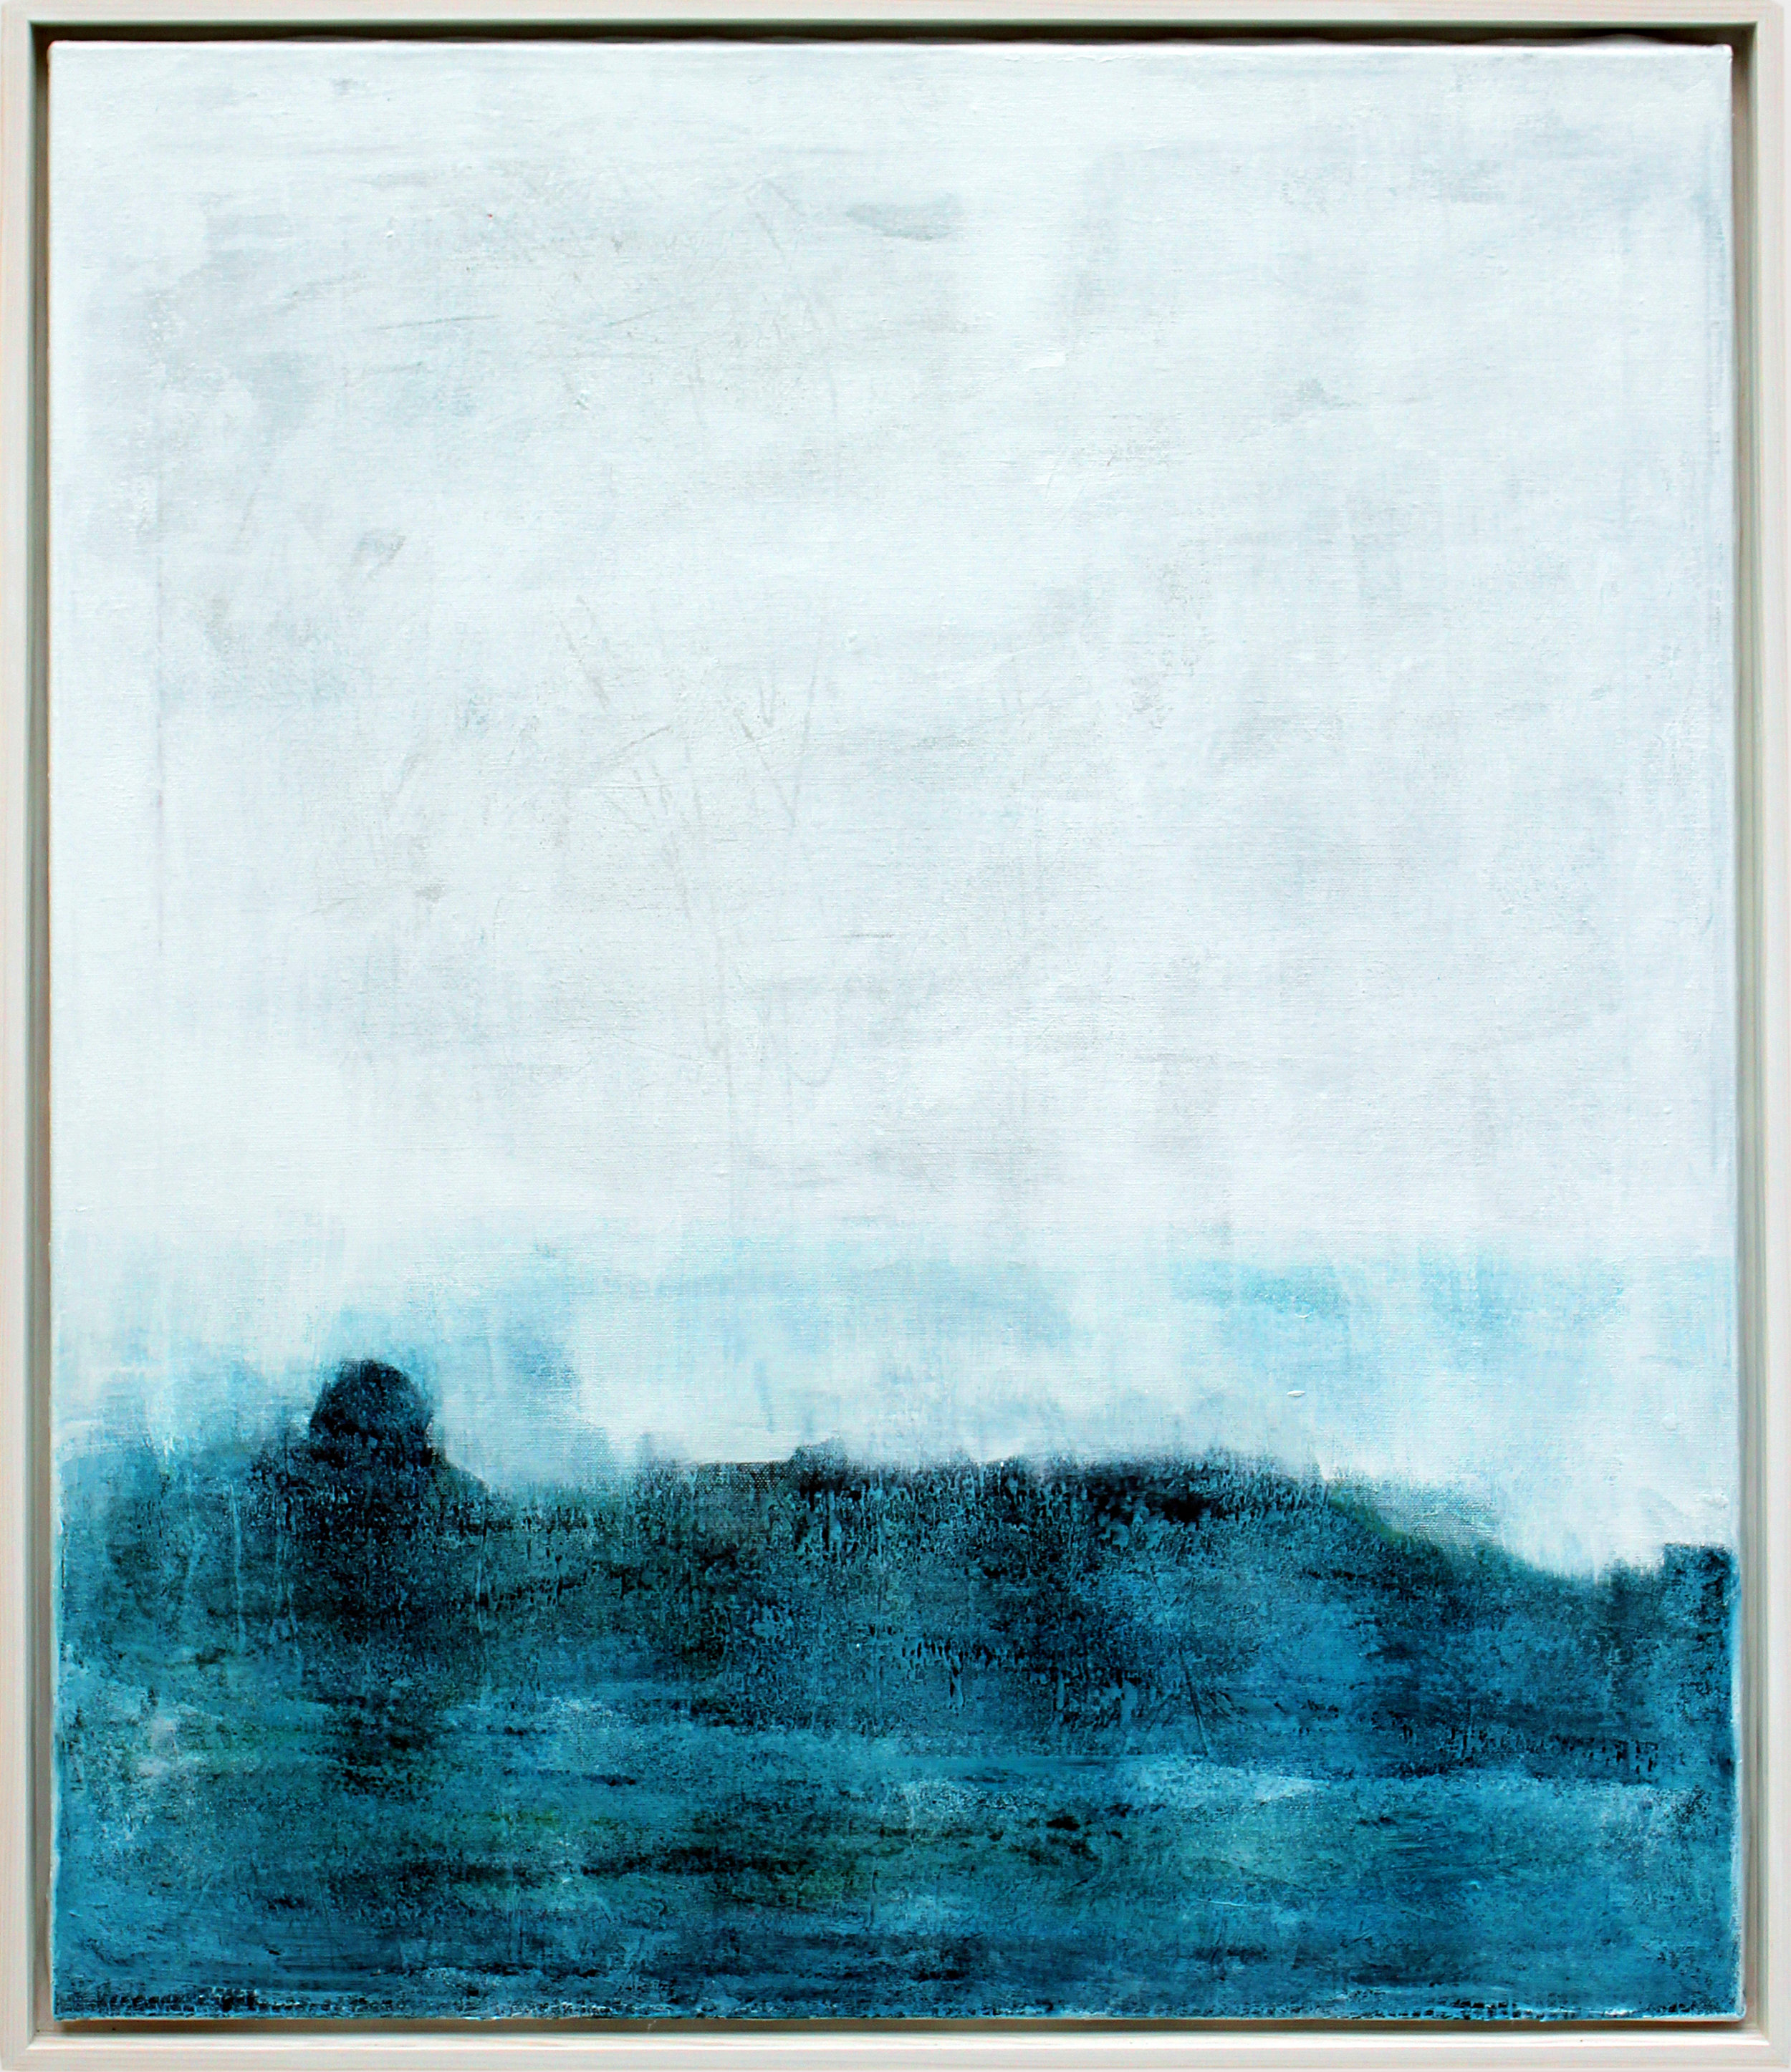 MISTY RAIN oils on canvas 100 x 60 cm SOLD 🔴